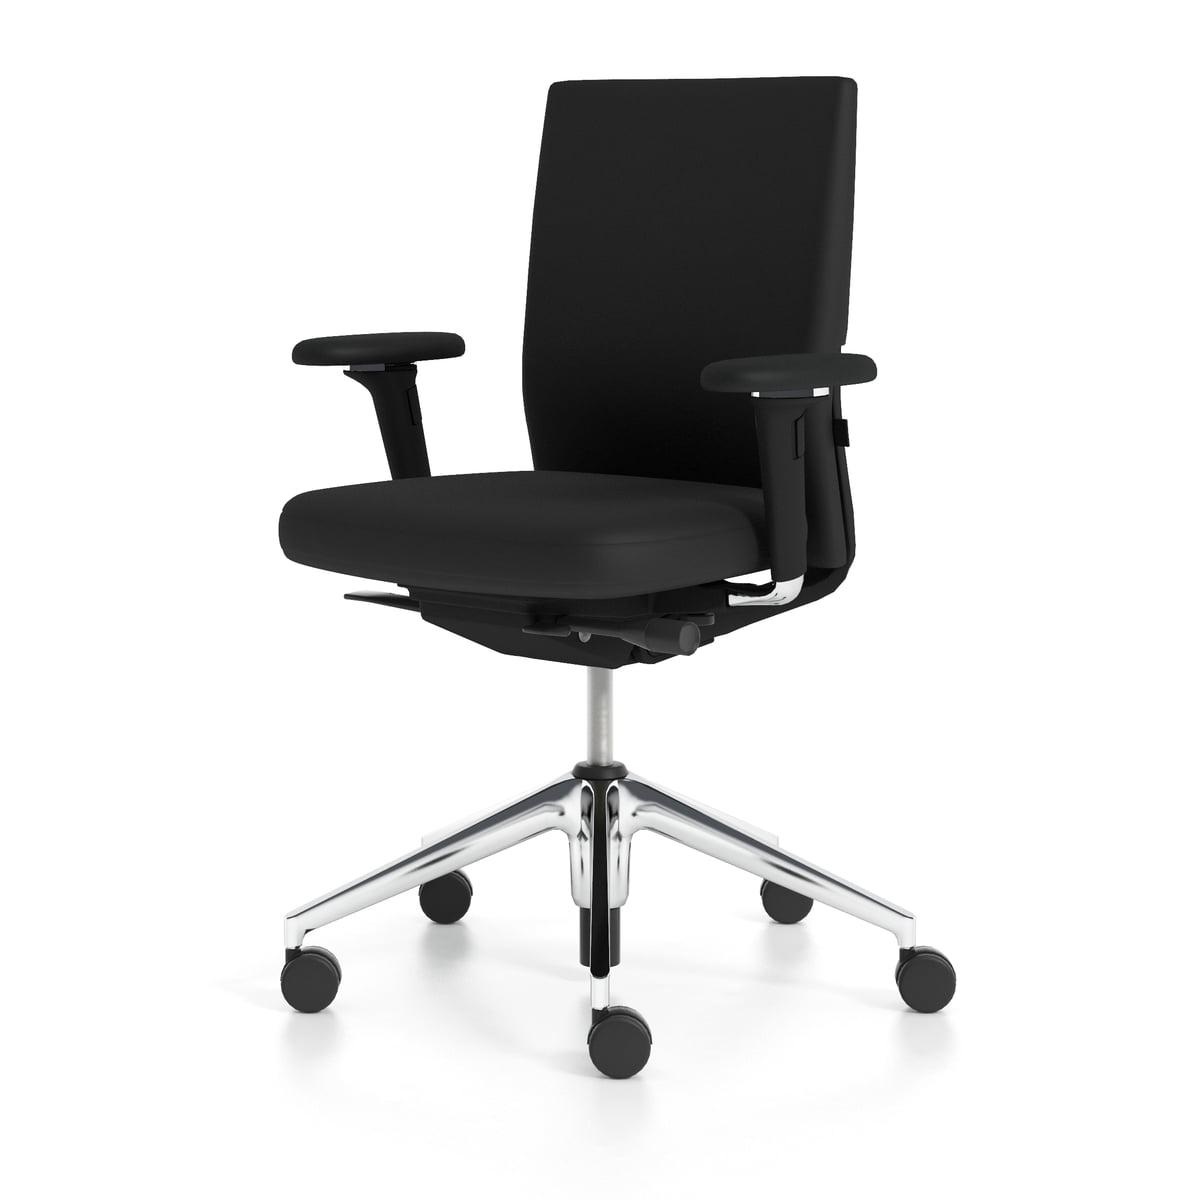 Vitra - ID Soft Black Special with forward tilt, with seat depth  adjustment, Trevira CS black / basic dark (hard castors)